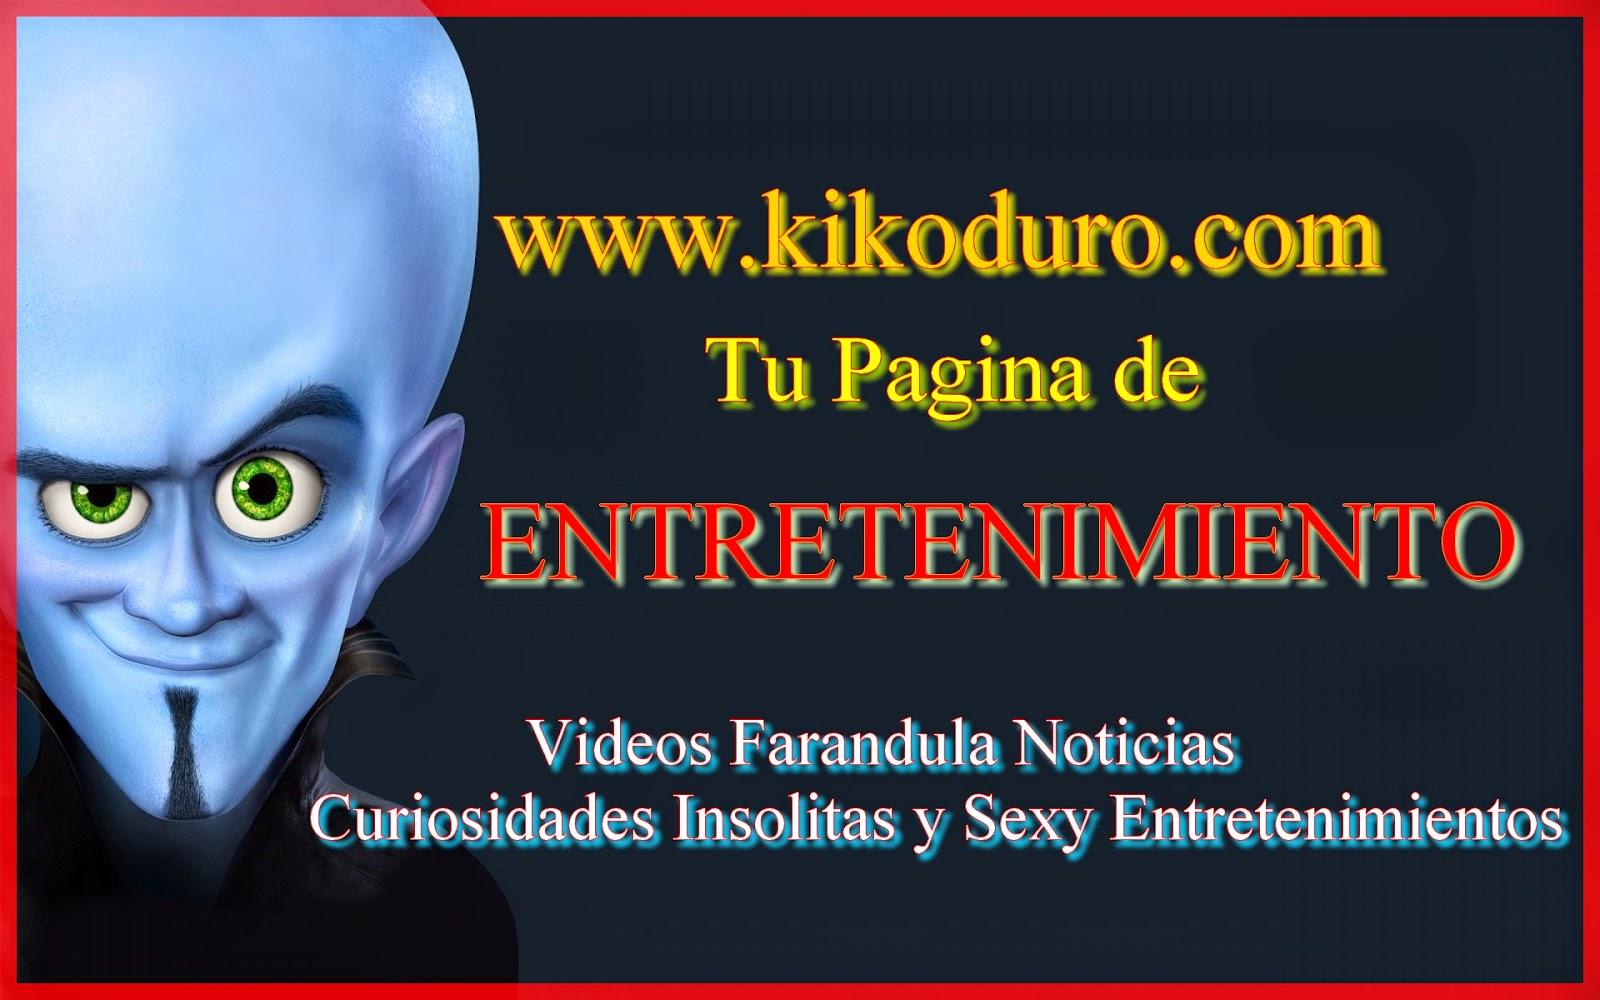 http://www.kikoduro.com/